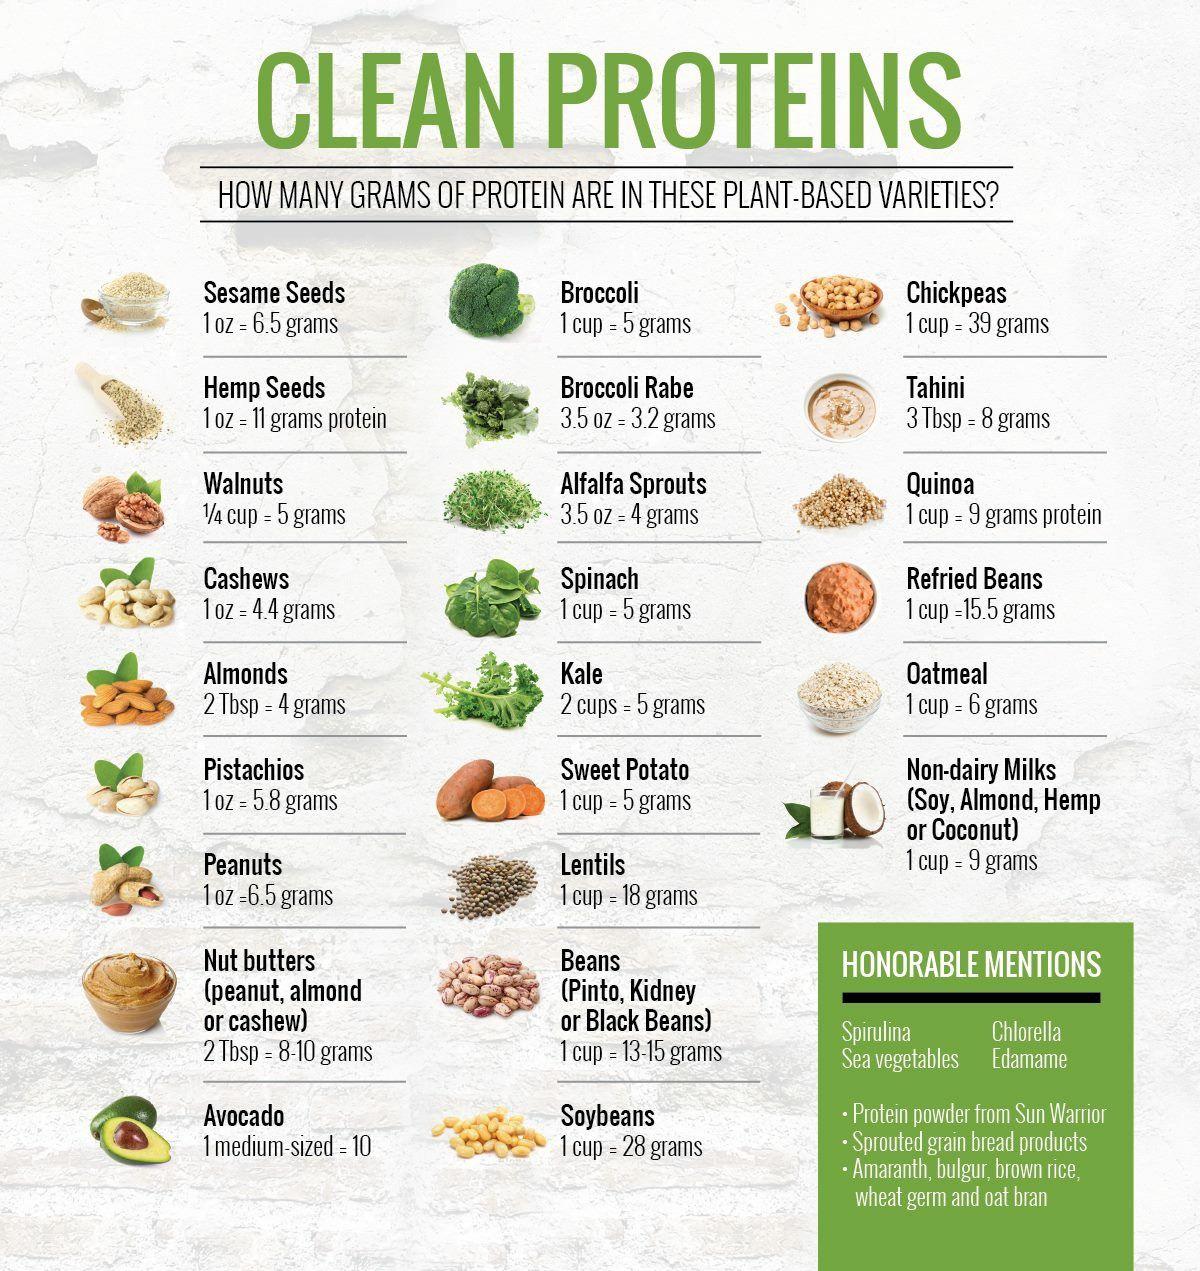 Vegan nutrition image by Cari Caldwell Mathews on Yummy...